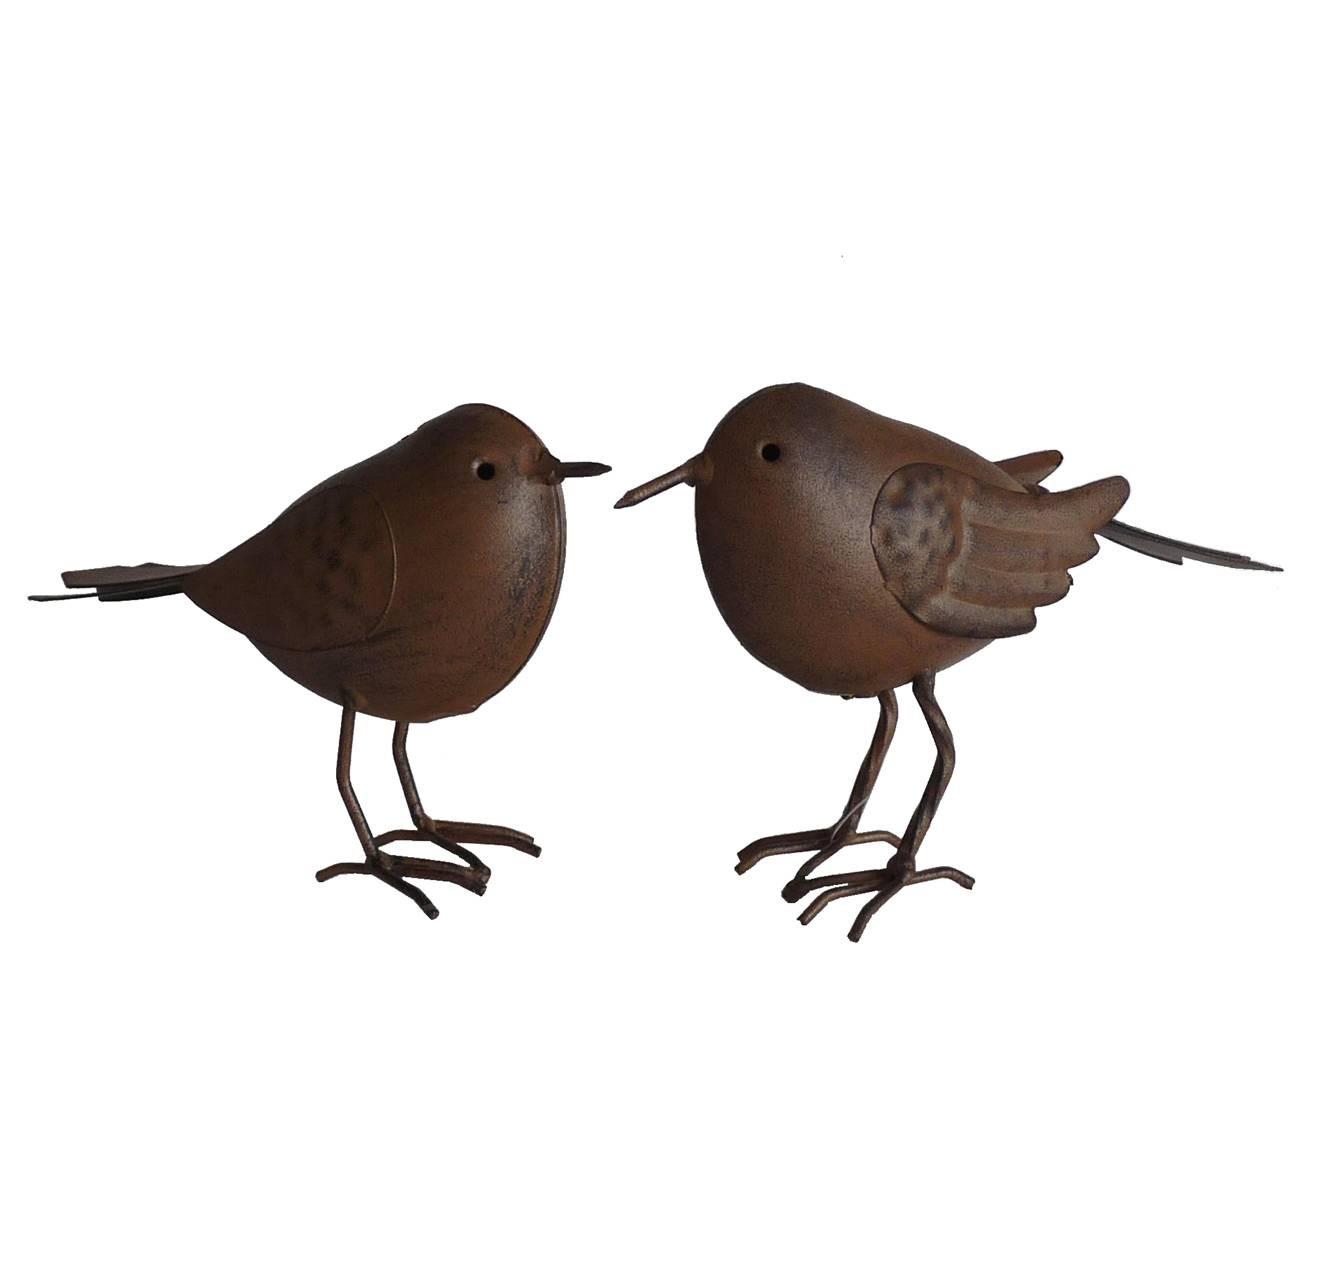 Decoration de jardin oiseaux